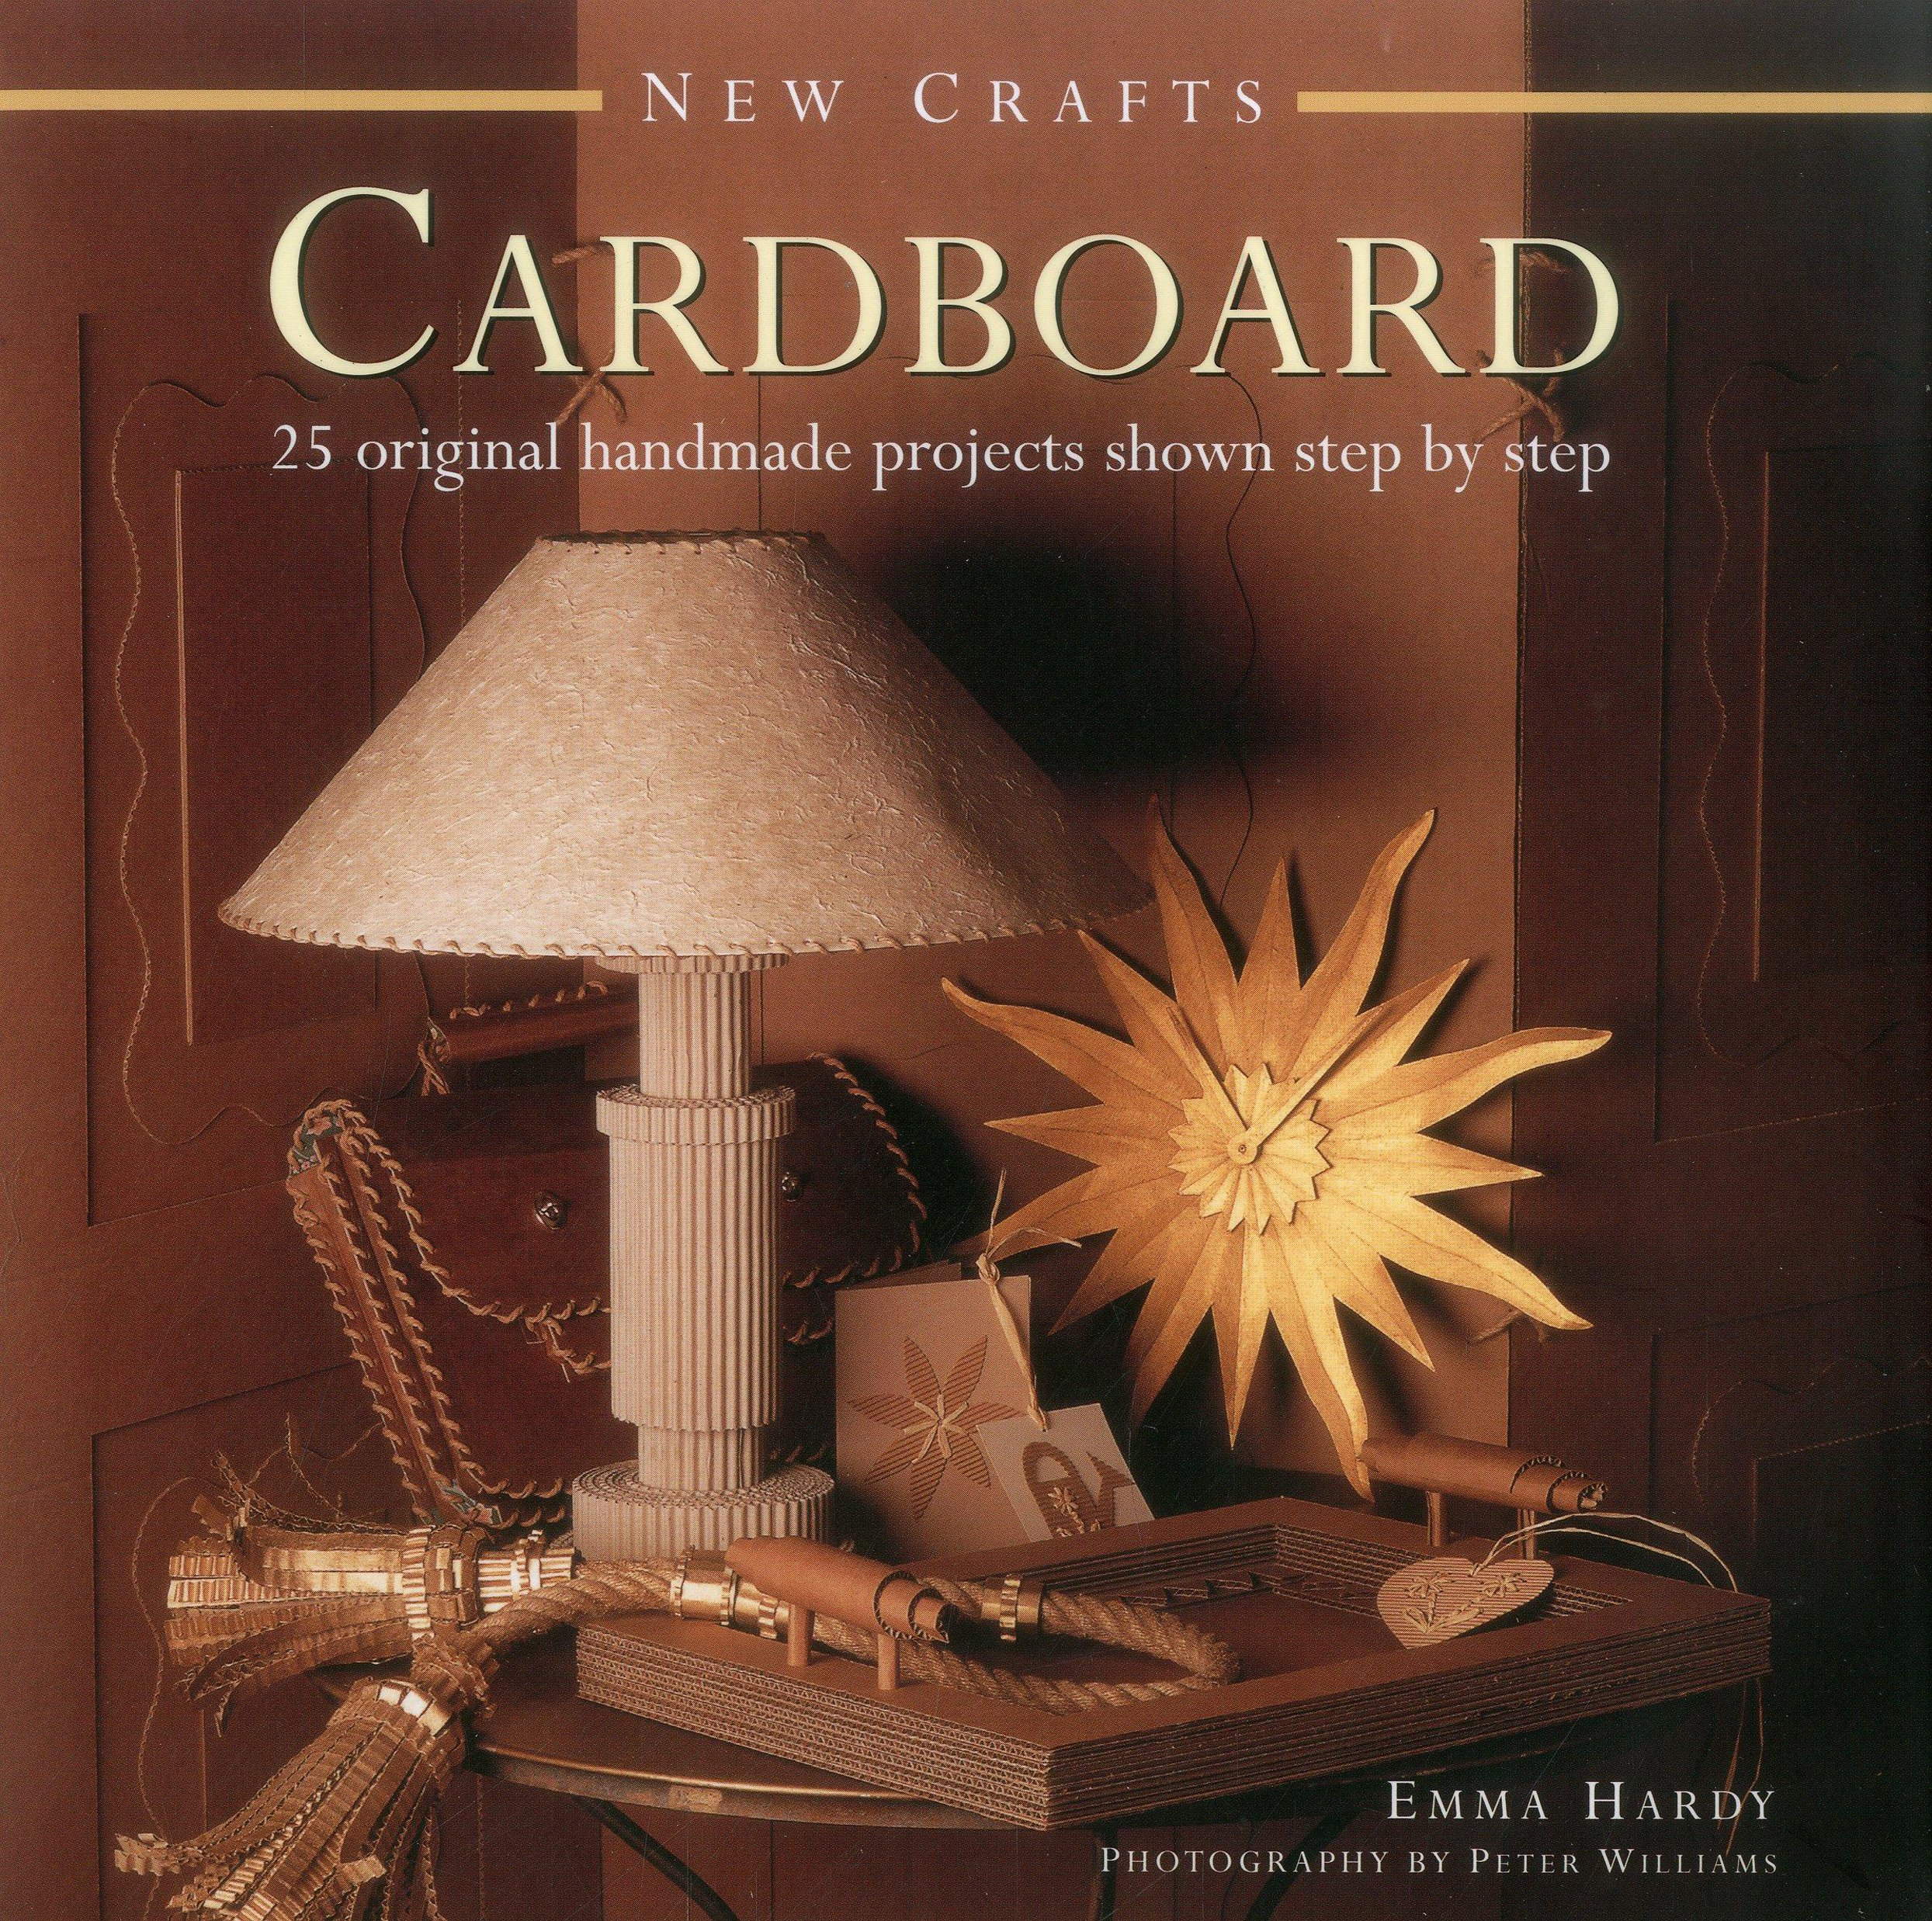 Original crafts from cardboard